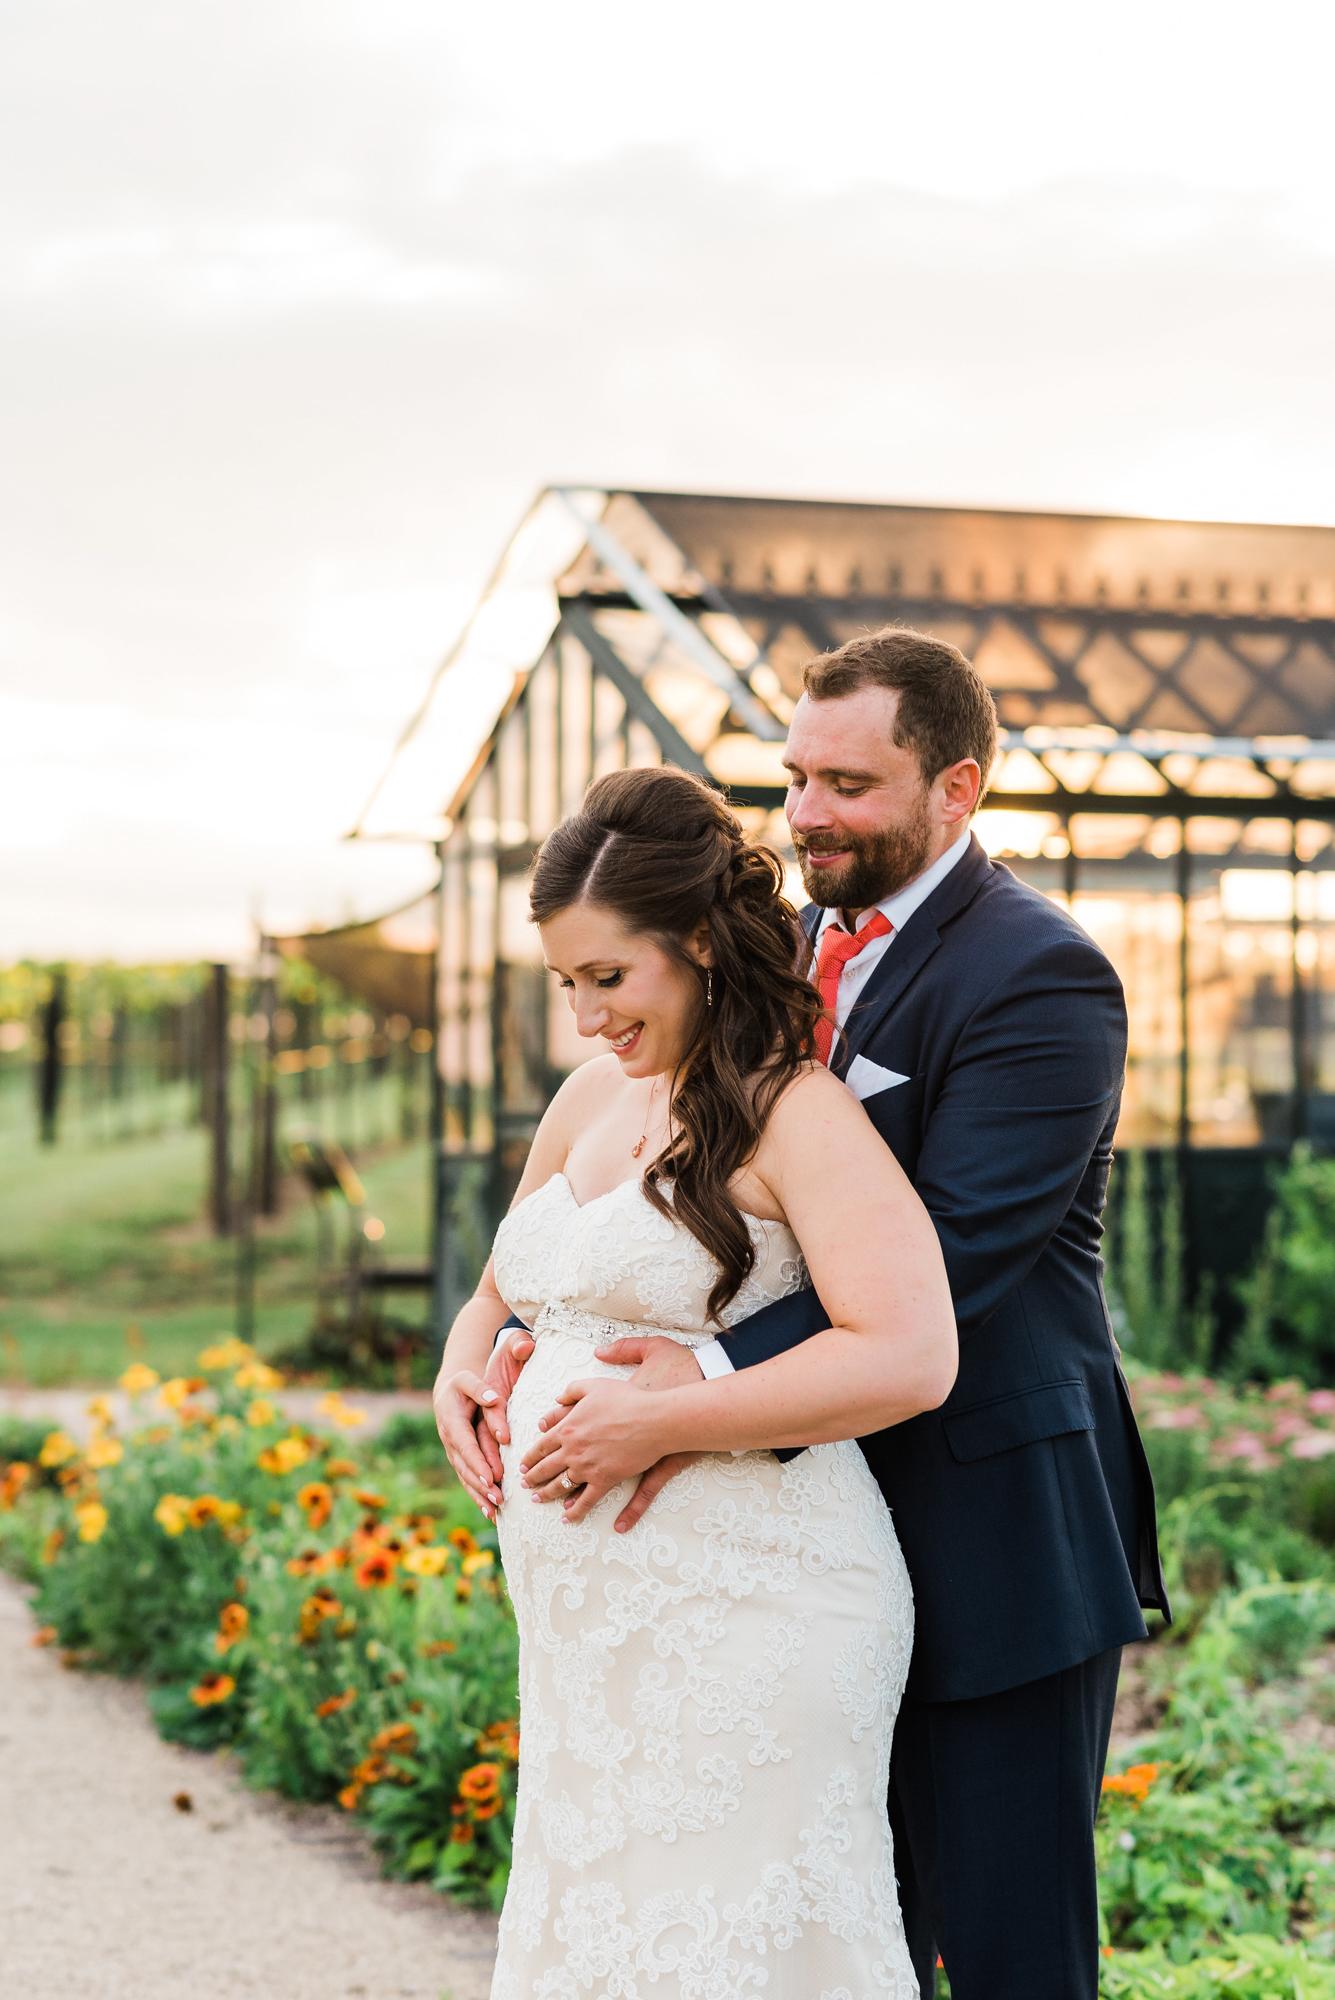 Buchanan House Winery - Tipton, Iowa, Wedding Photographer